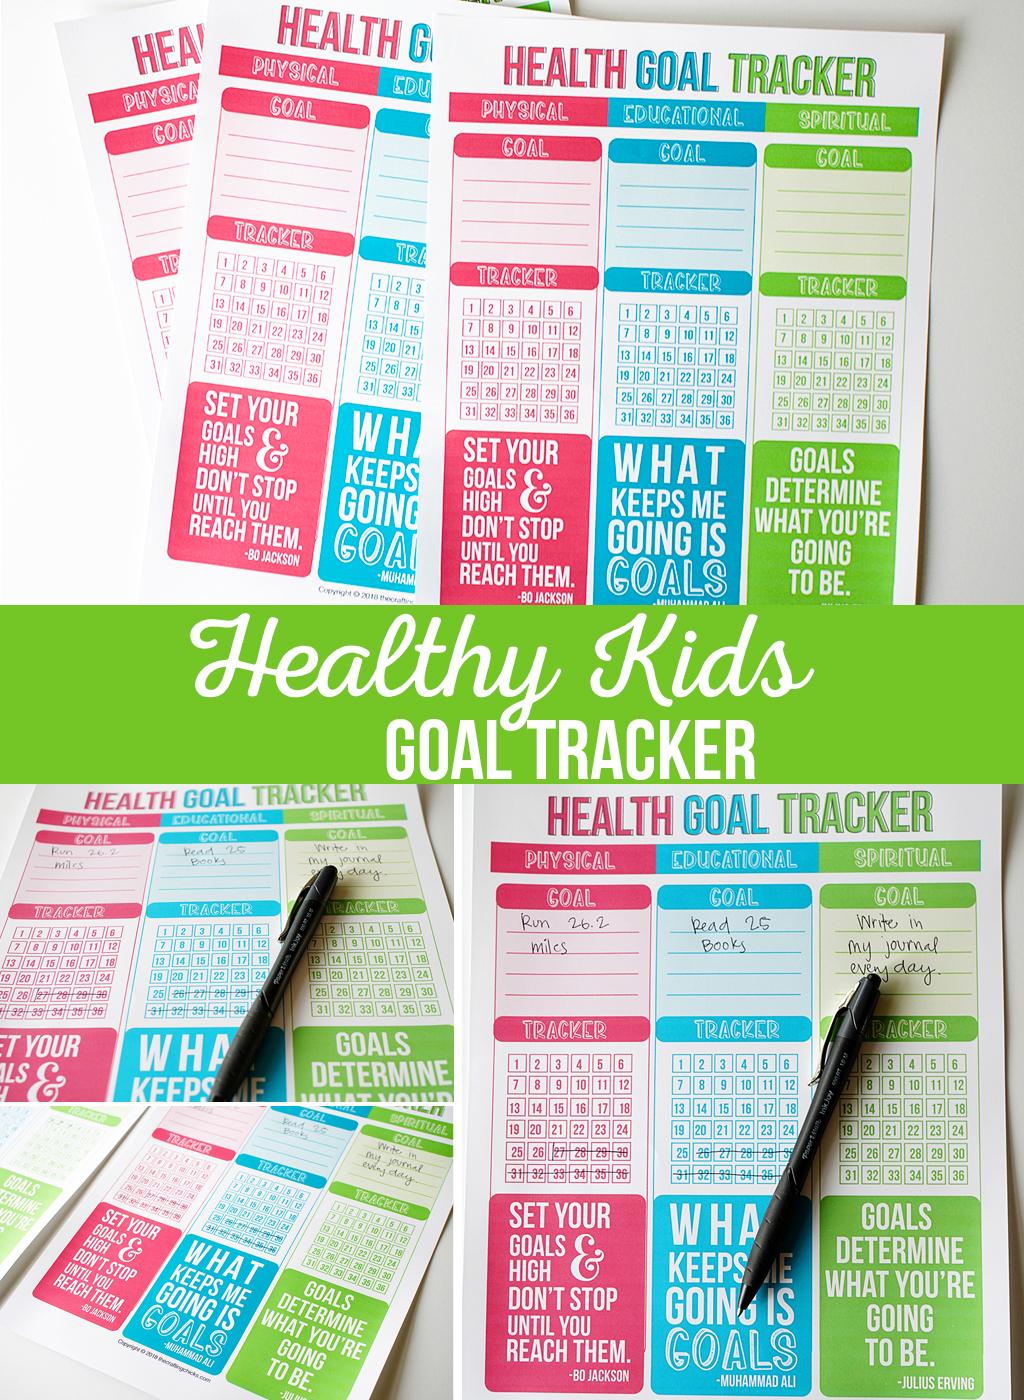 Healthy Kids Goal Tracker